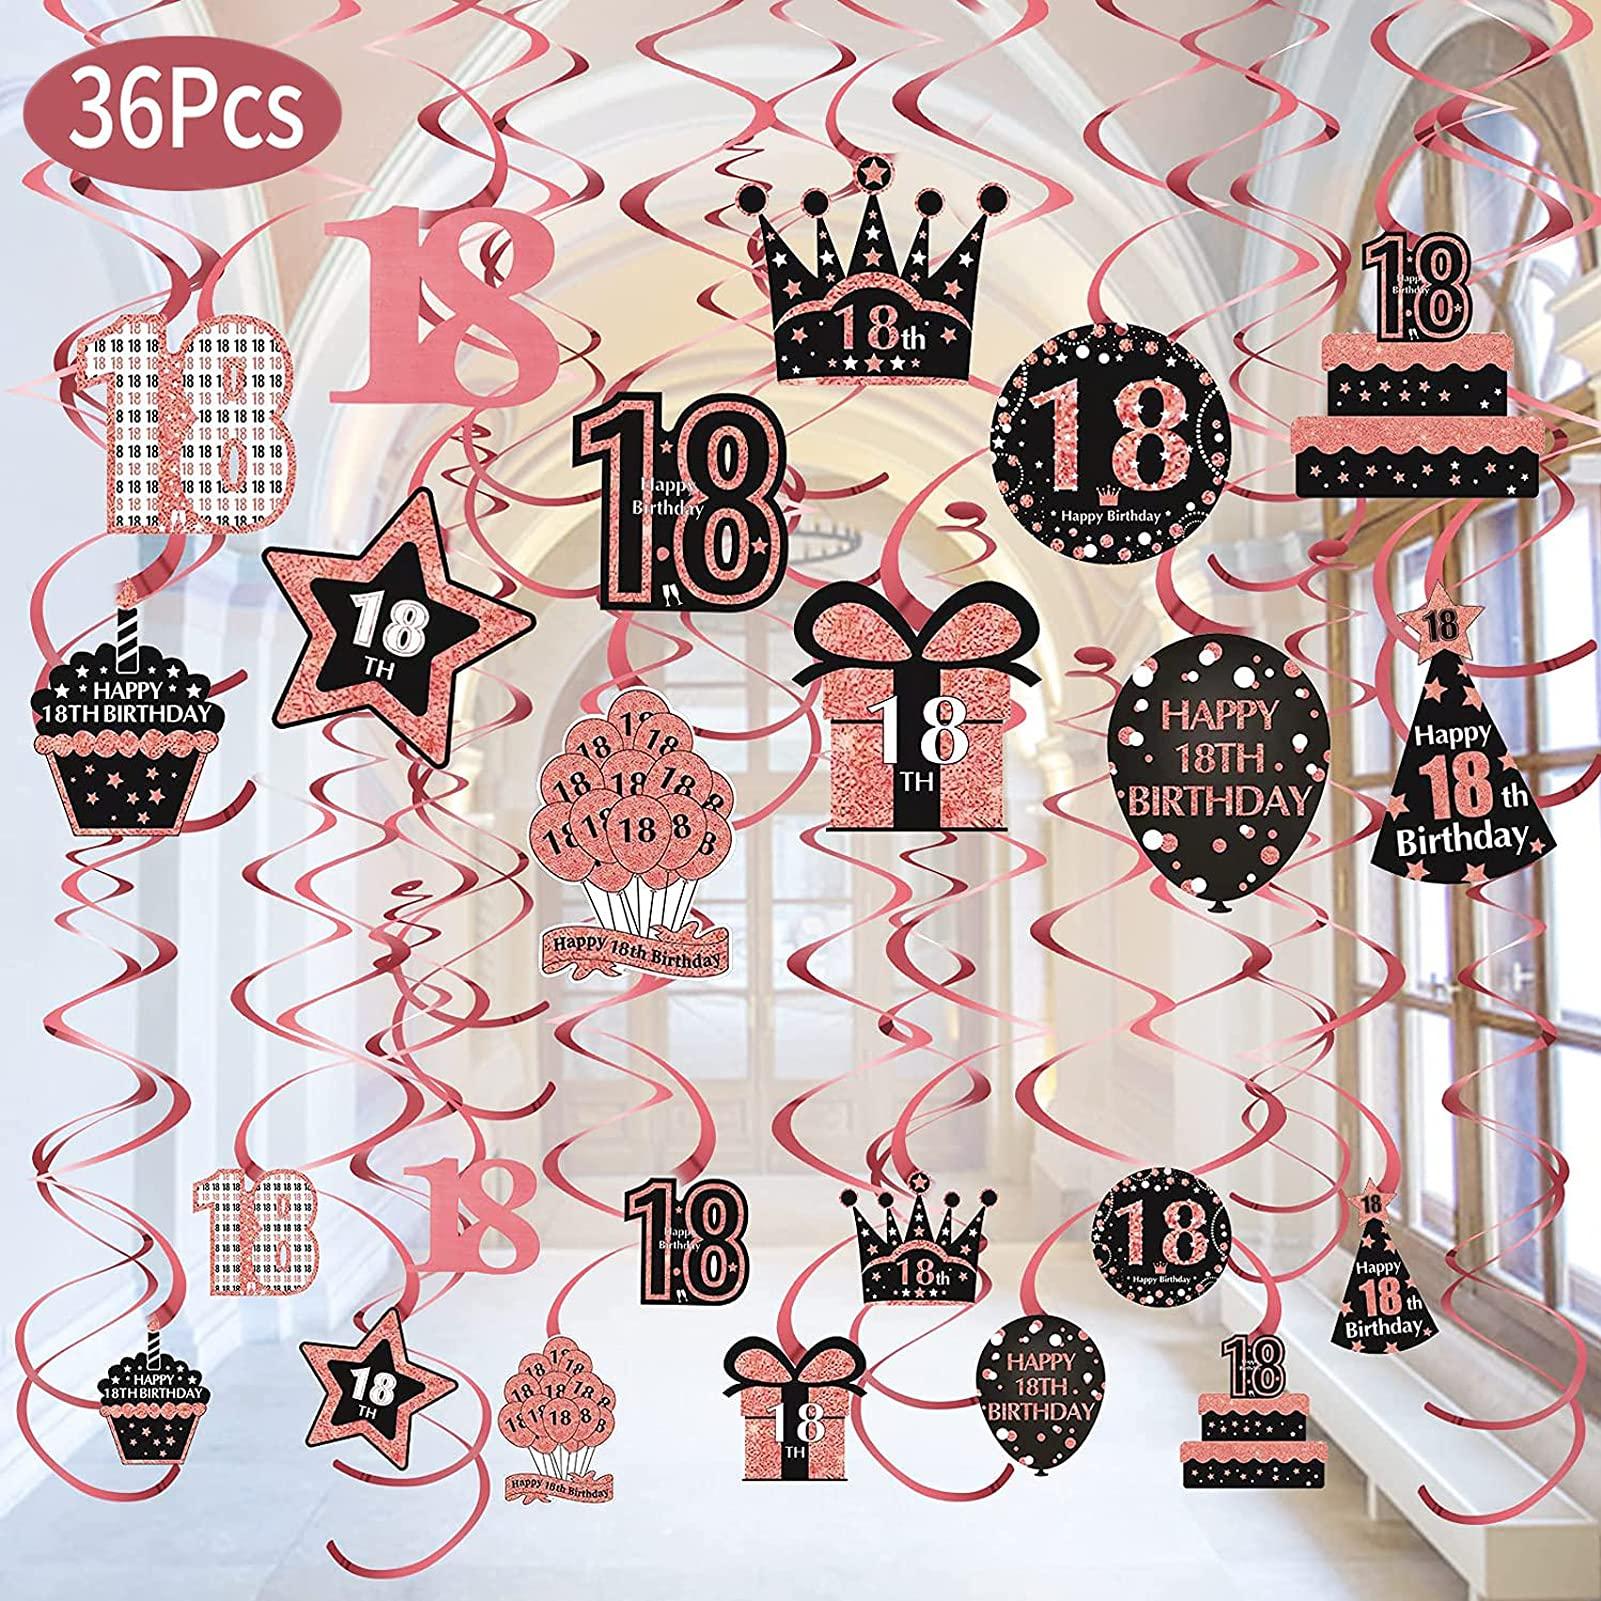 36Pcs 18th Birthday Hanging Swirls Decorations for Girls, Happy 18 Year Old Birthday Swirls Supplies, Rose Gold Eighteen Birthday Party Hanging Swirl Decor